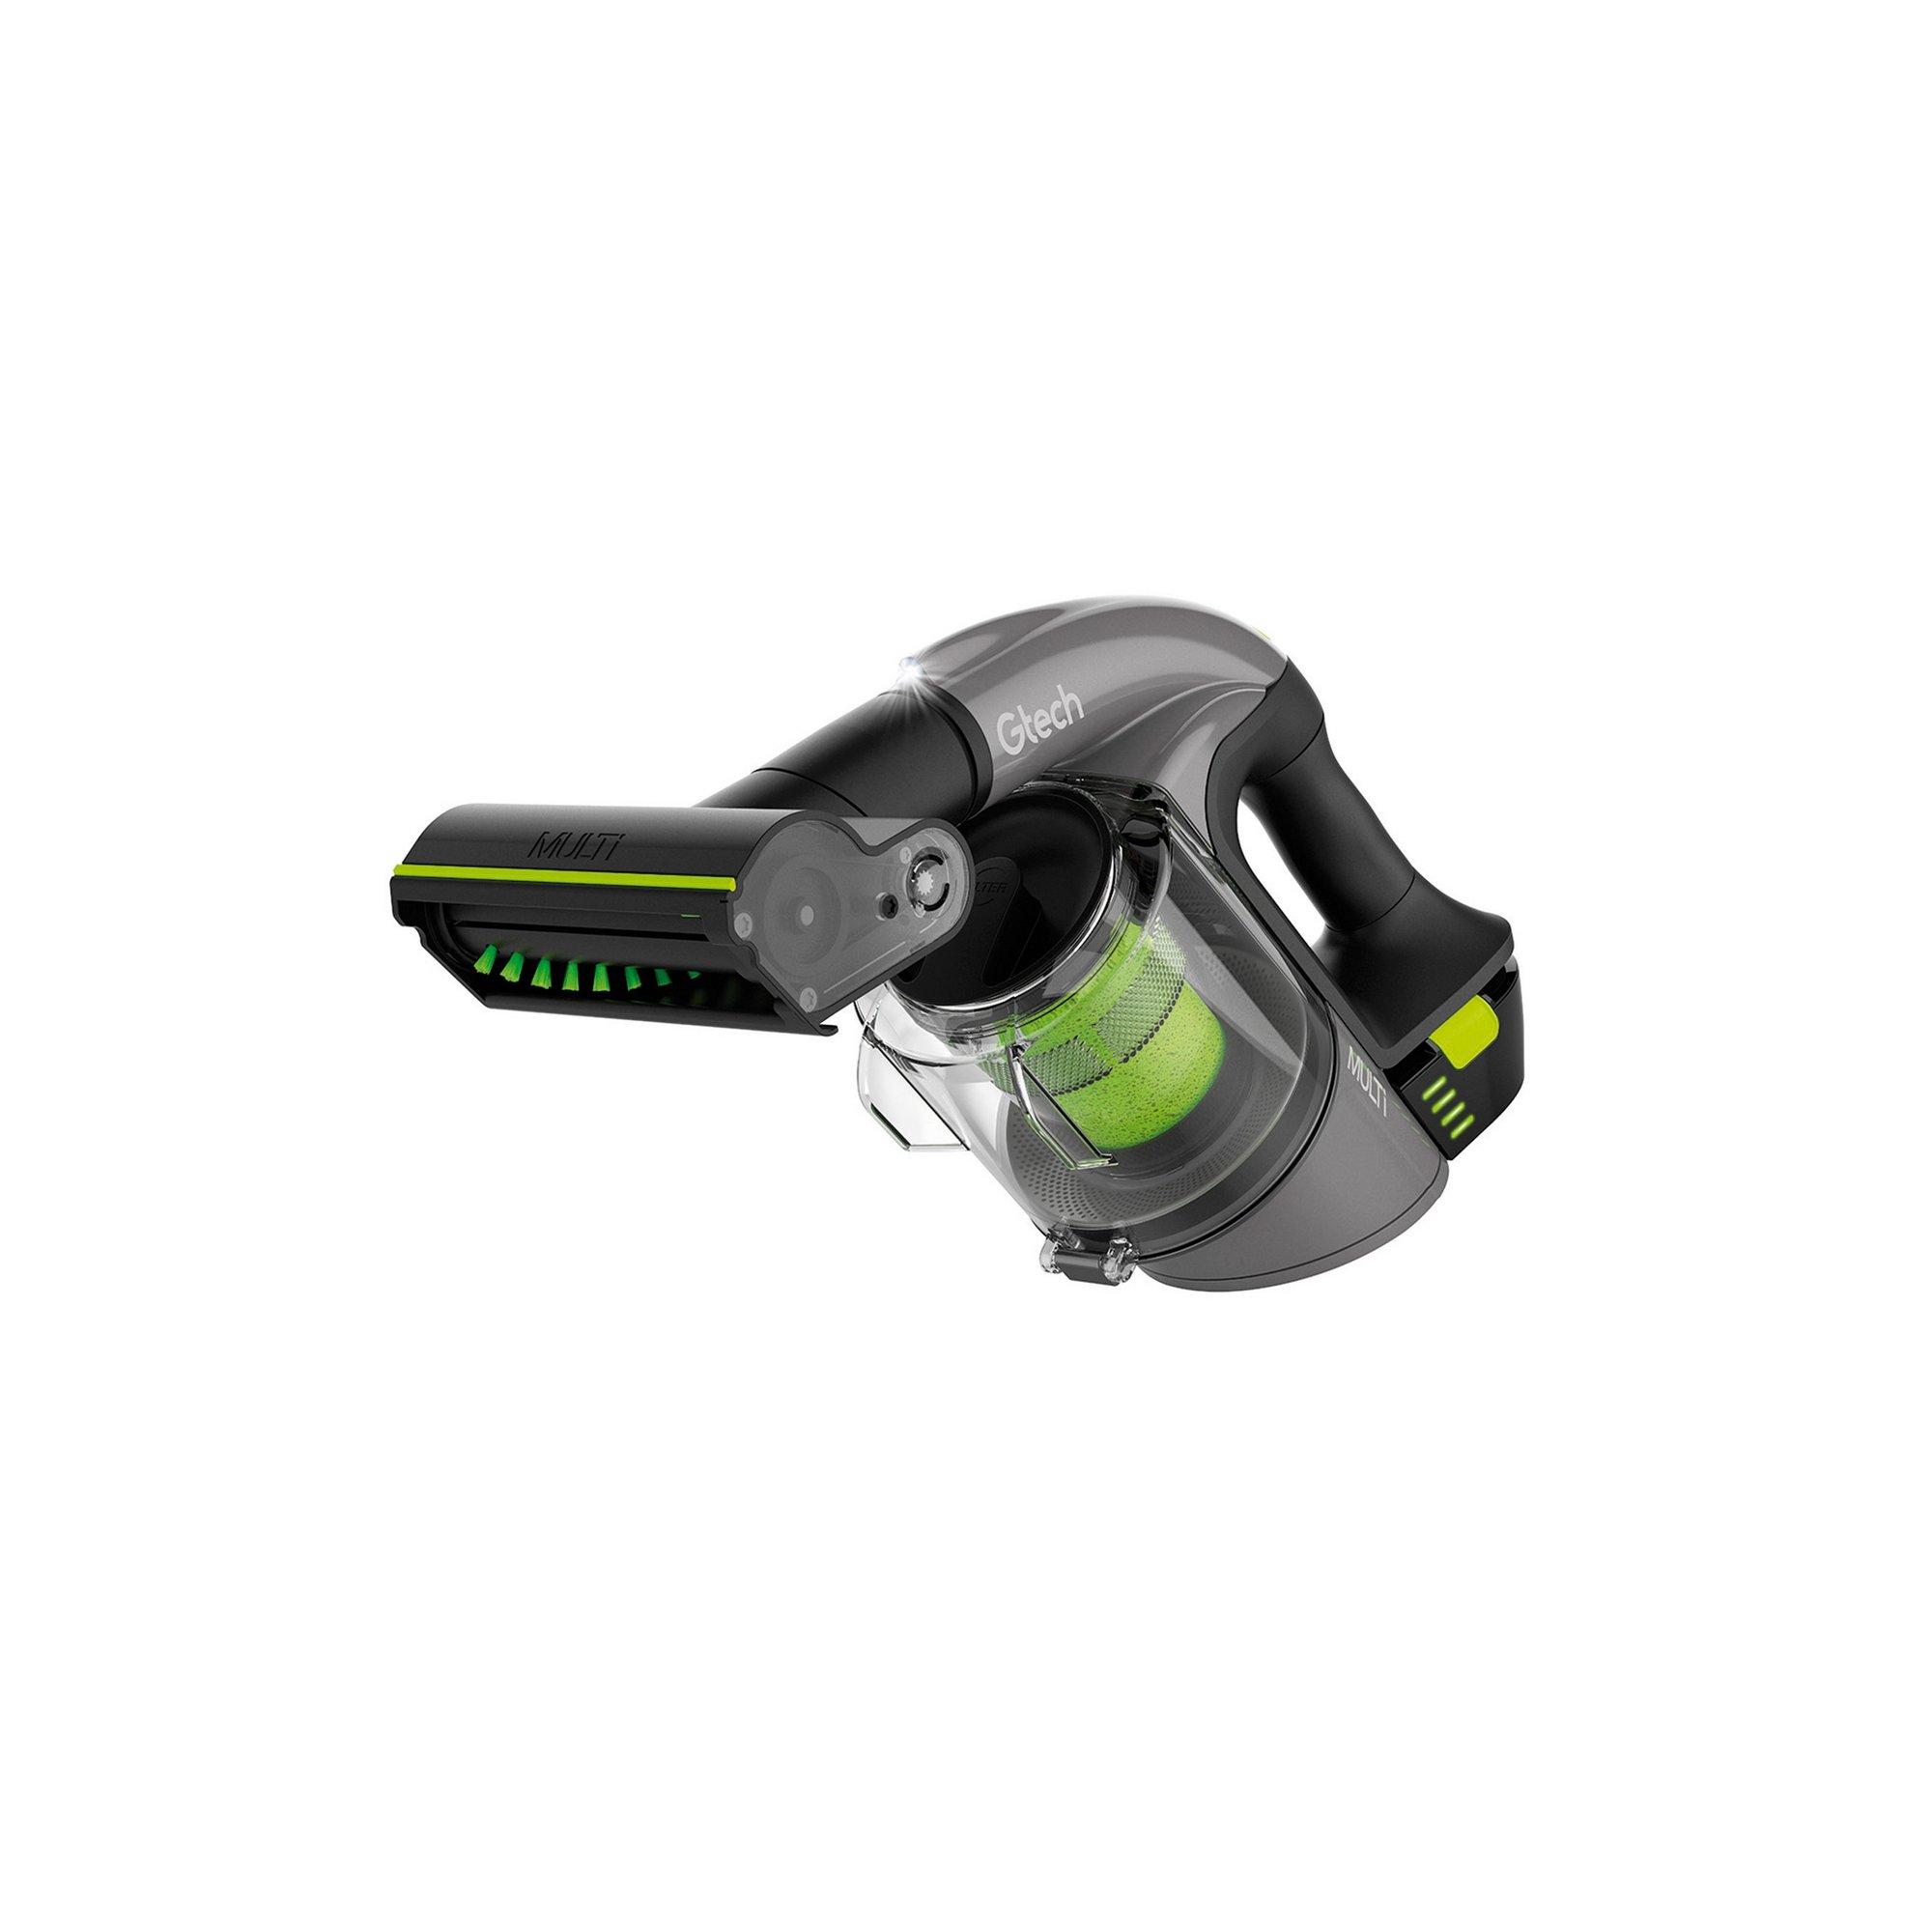 Image of Gtech Multi Mk2 Cordless Handheld Vacuum